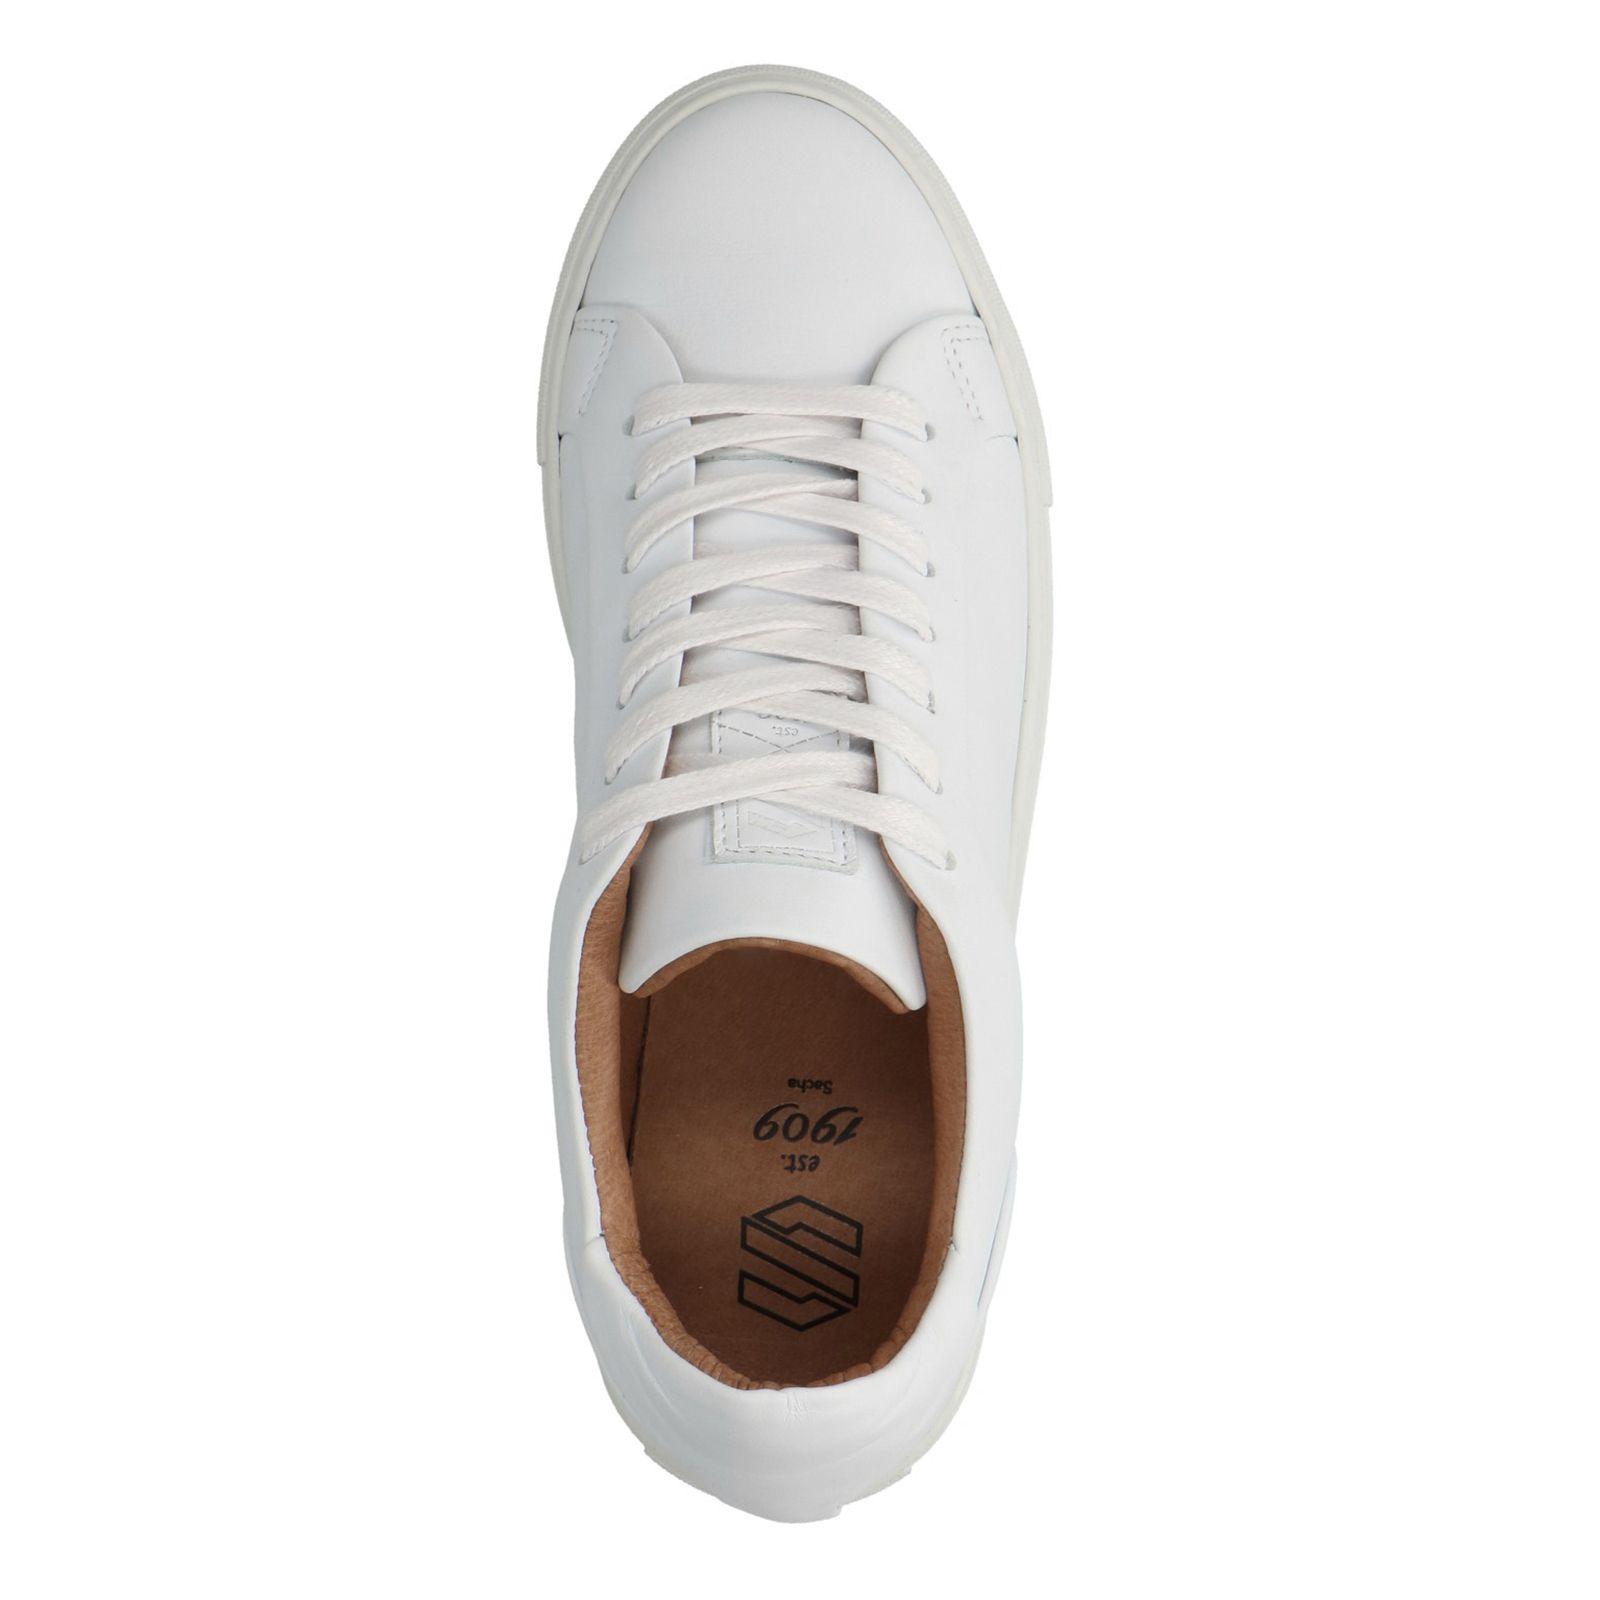 Sacha Witte leren lage sneakers